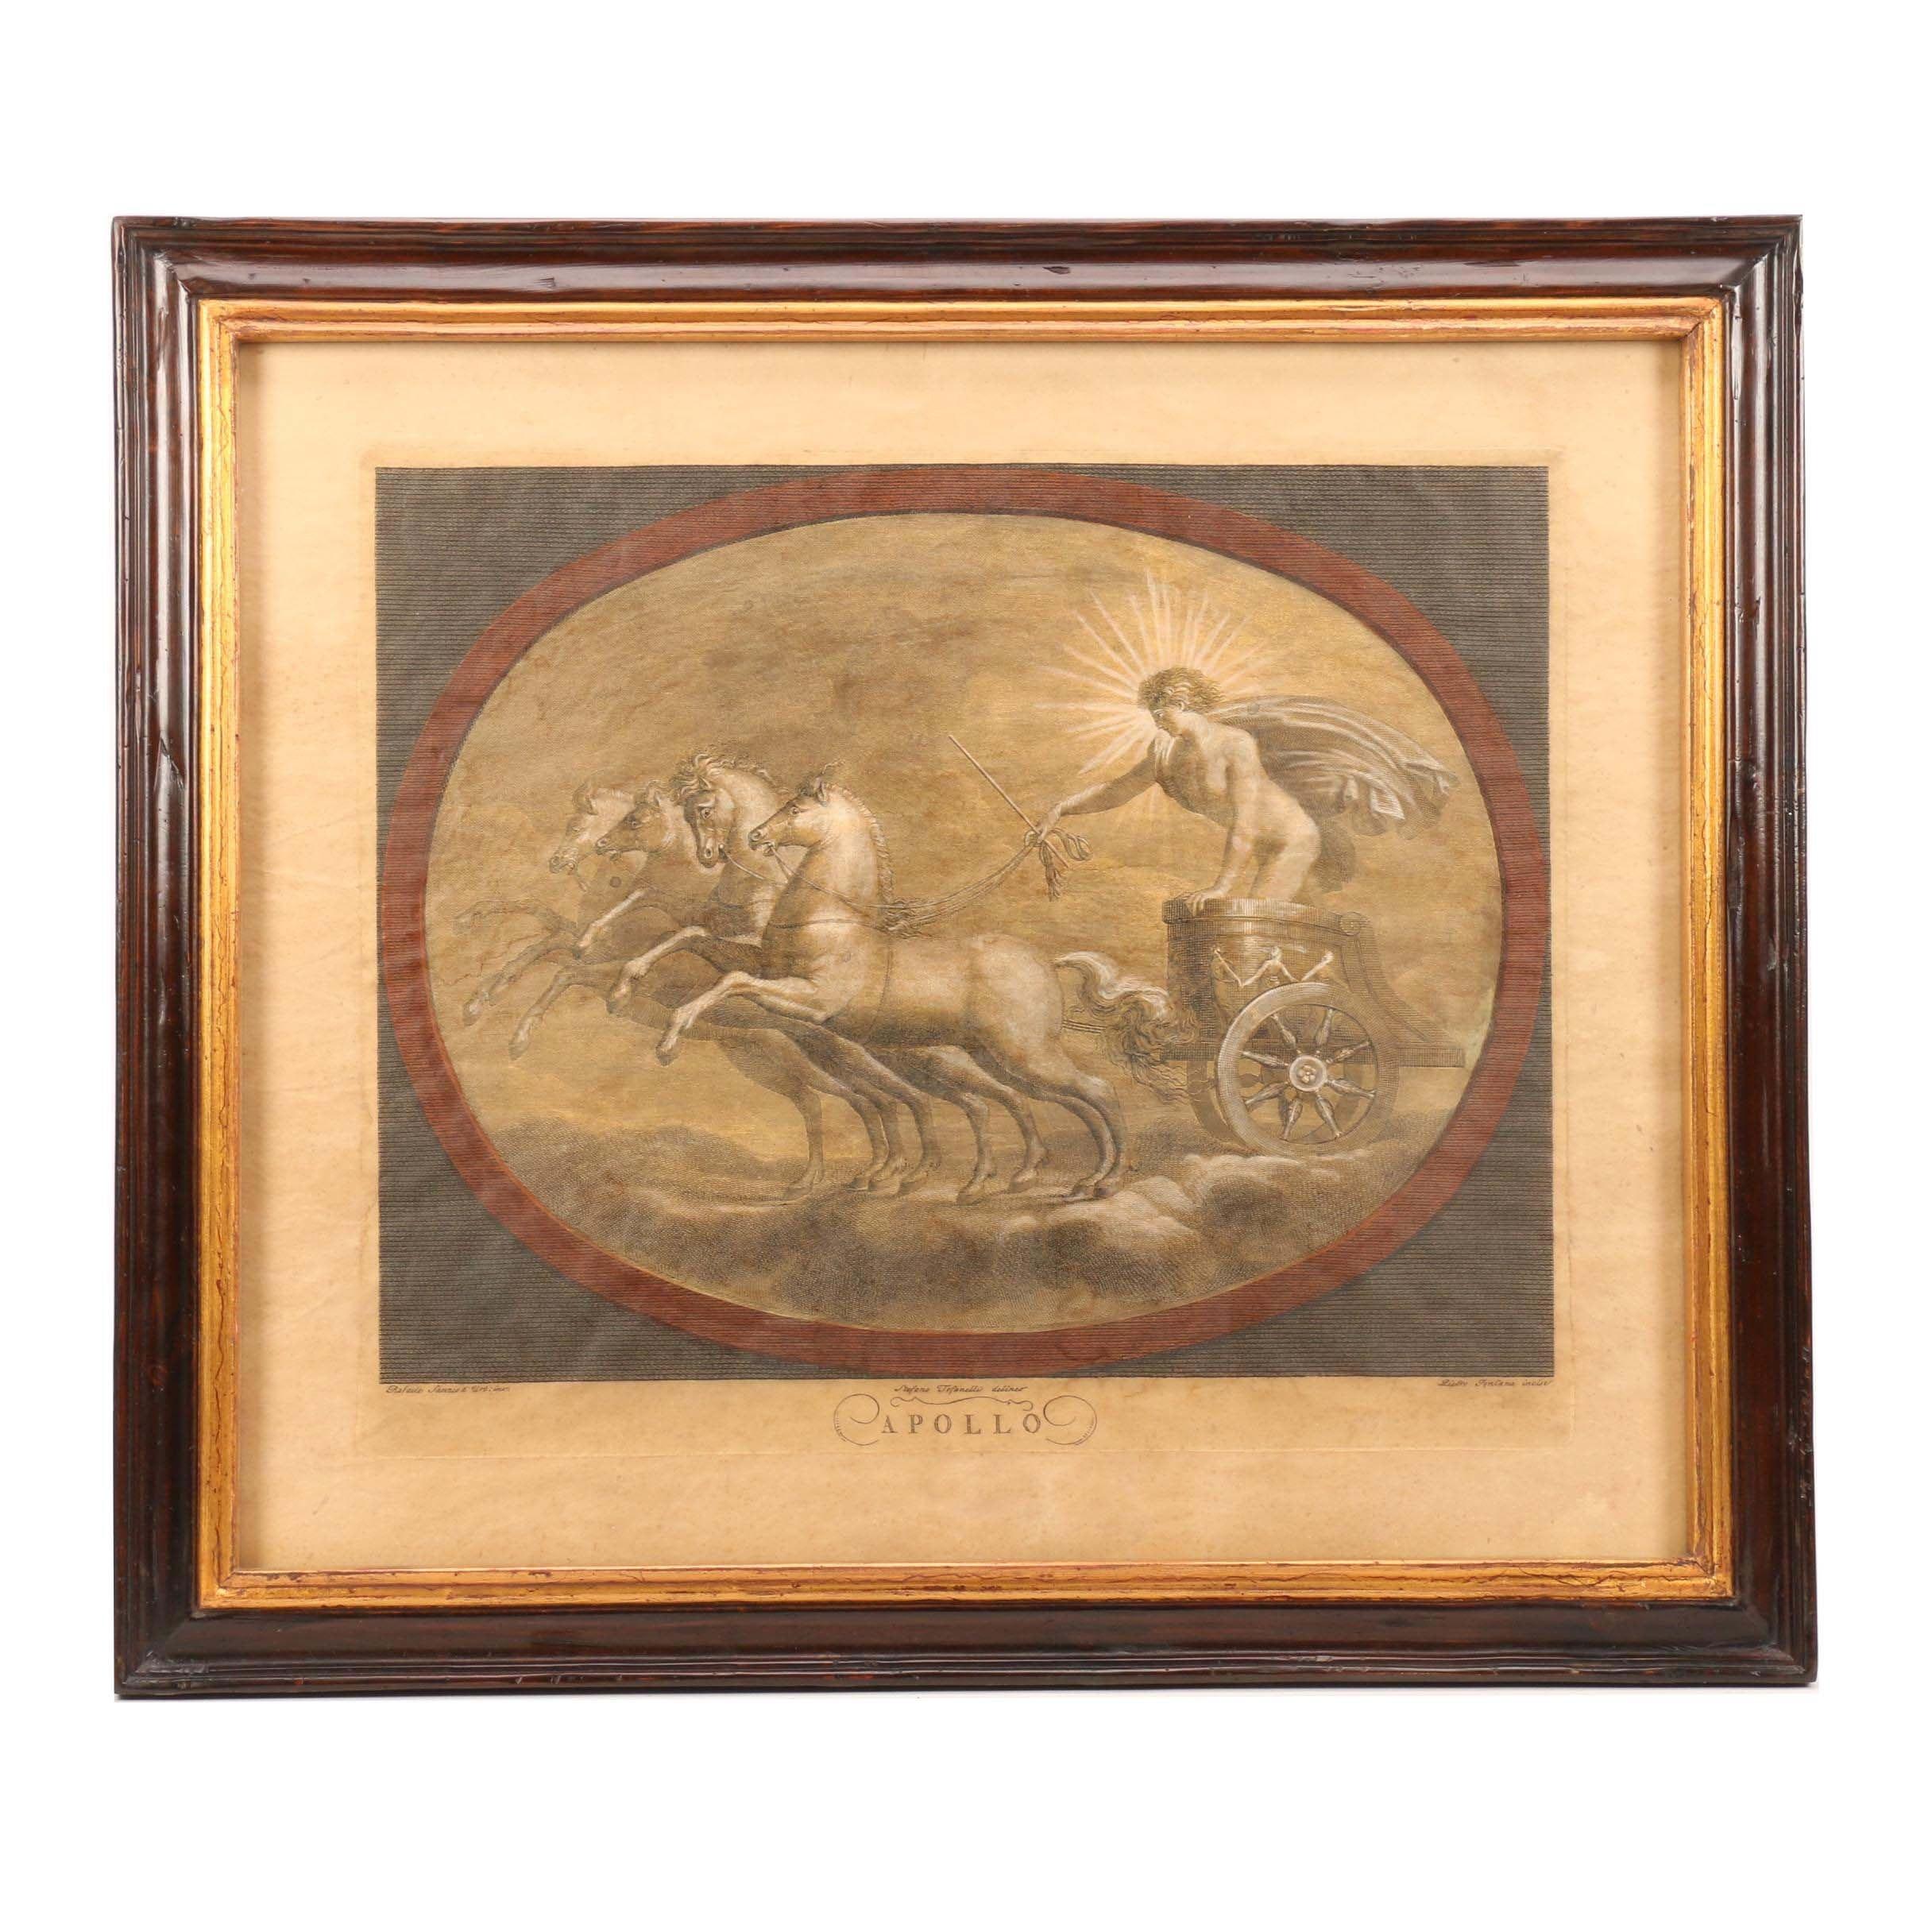 "Trevor James Lithograph after Raphael Sanzio d'Urbino ""Apollo"""